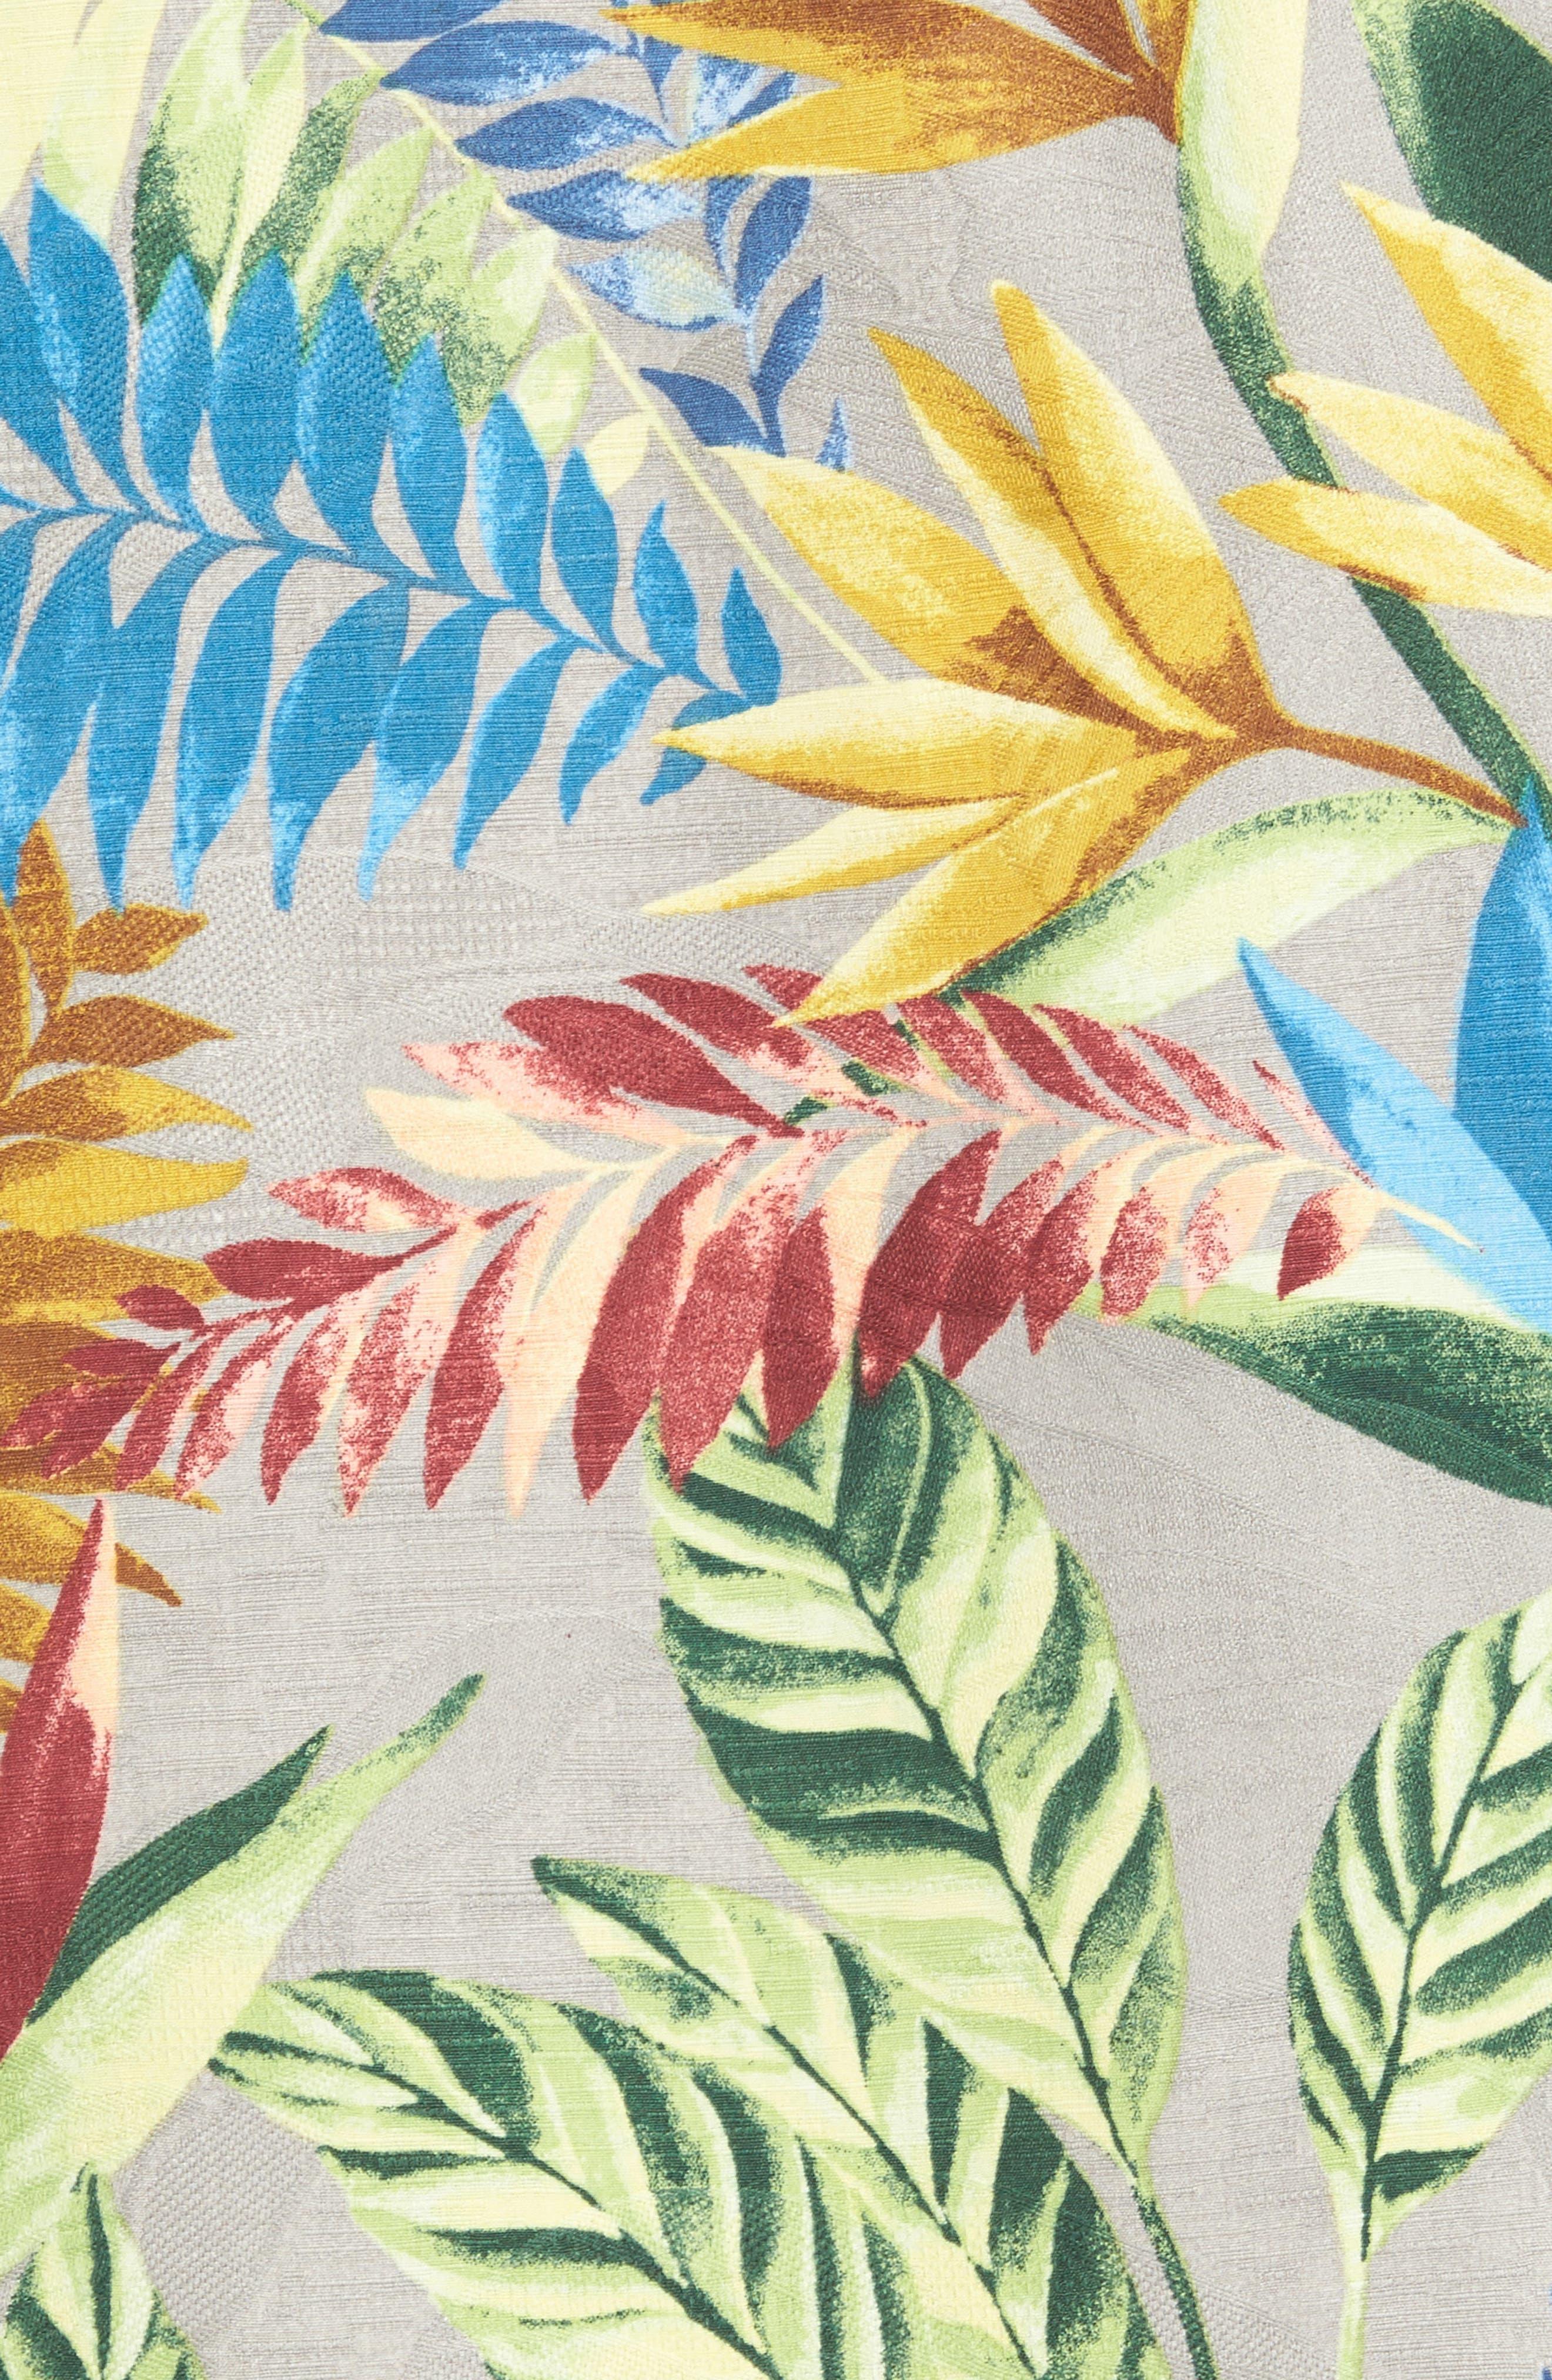 Taza Fronds Silk Brocade Woven Shirt,                             Alternate thumbnail 5, color,                             050